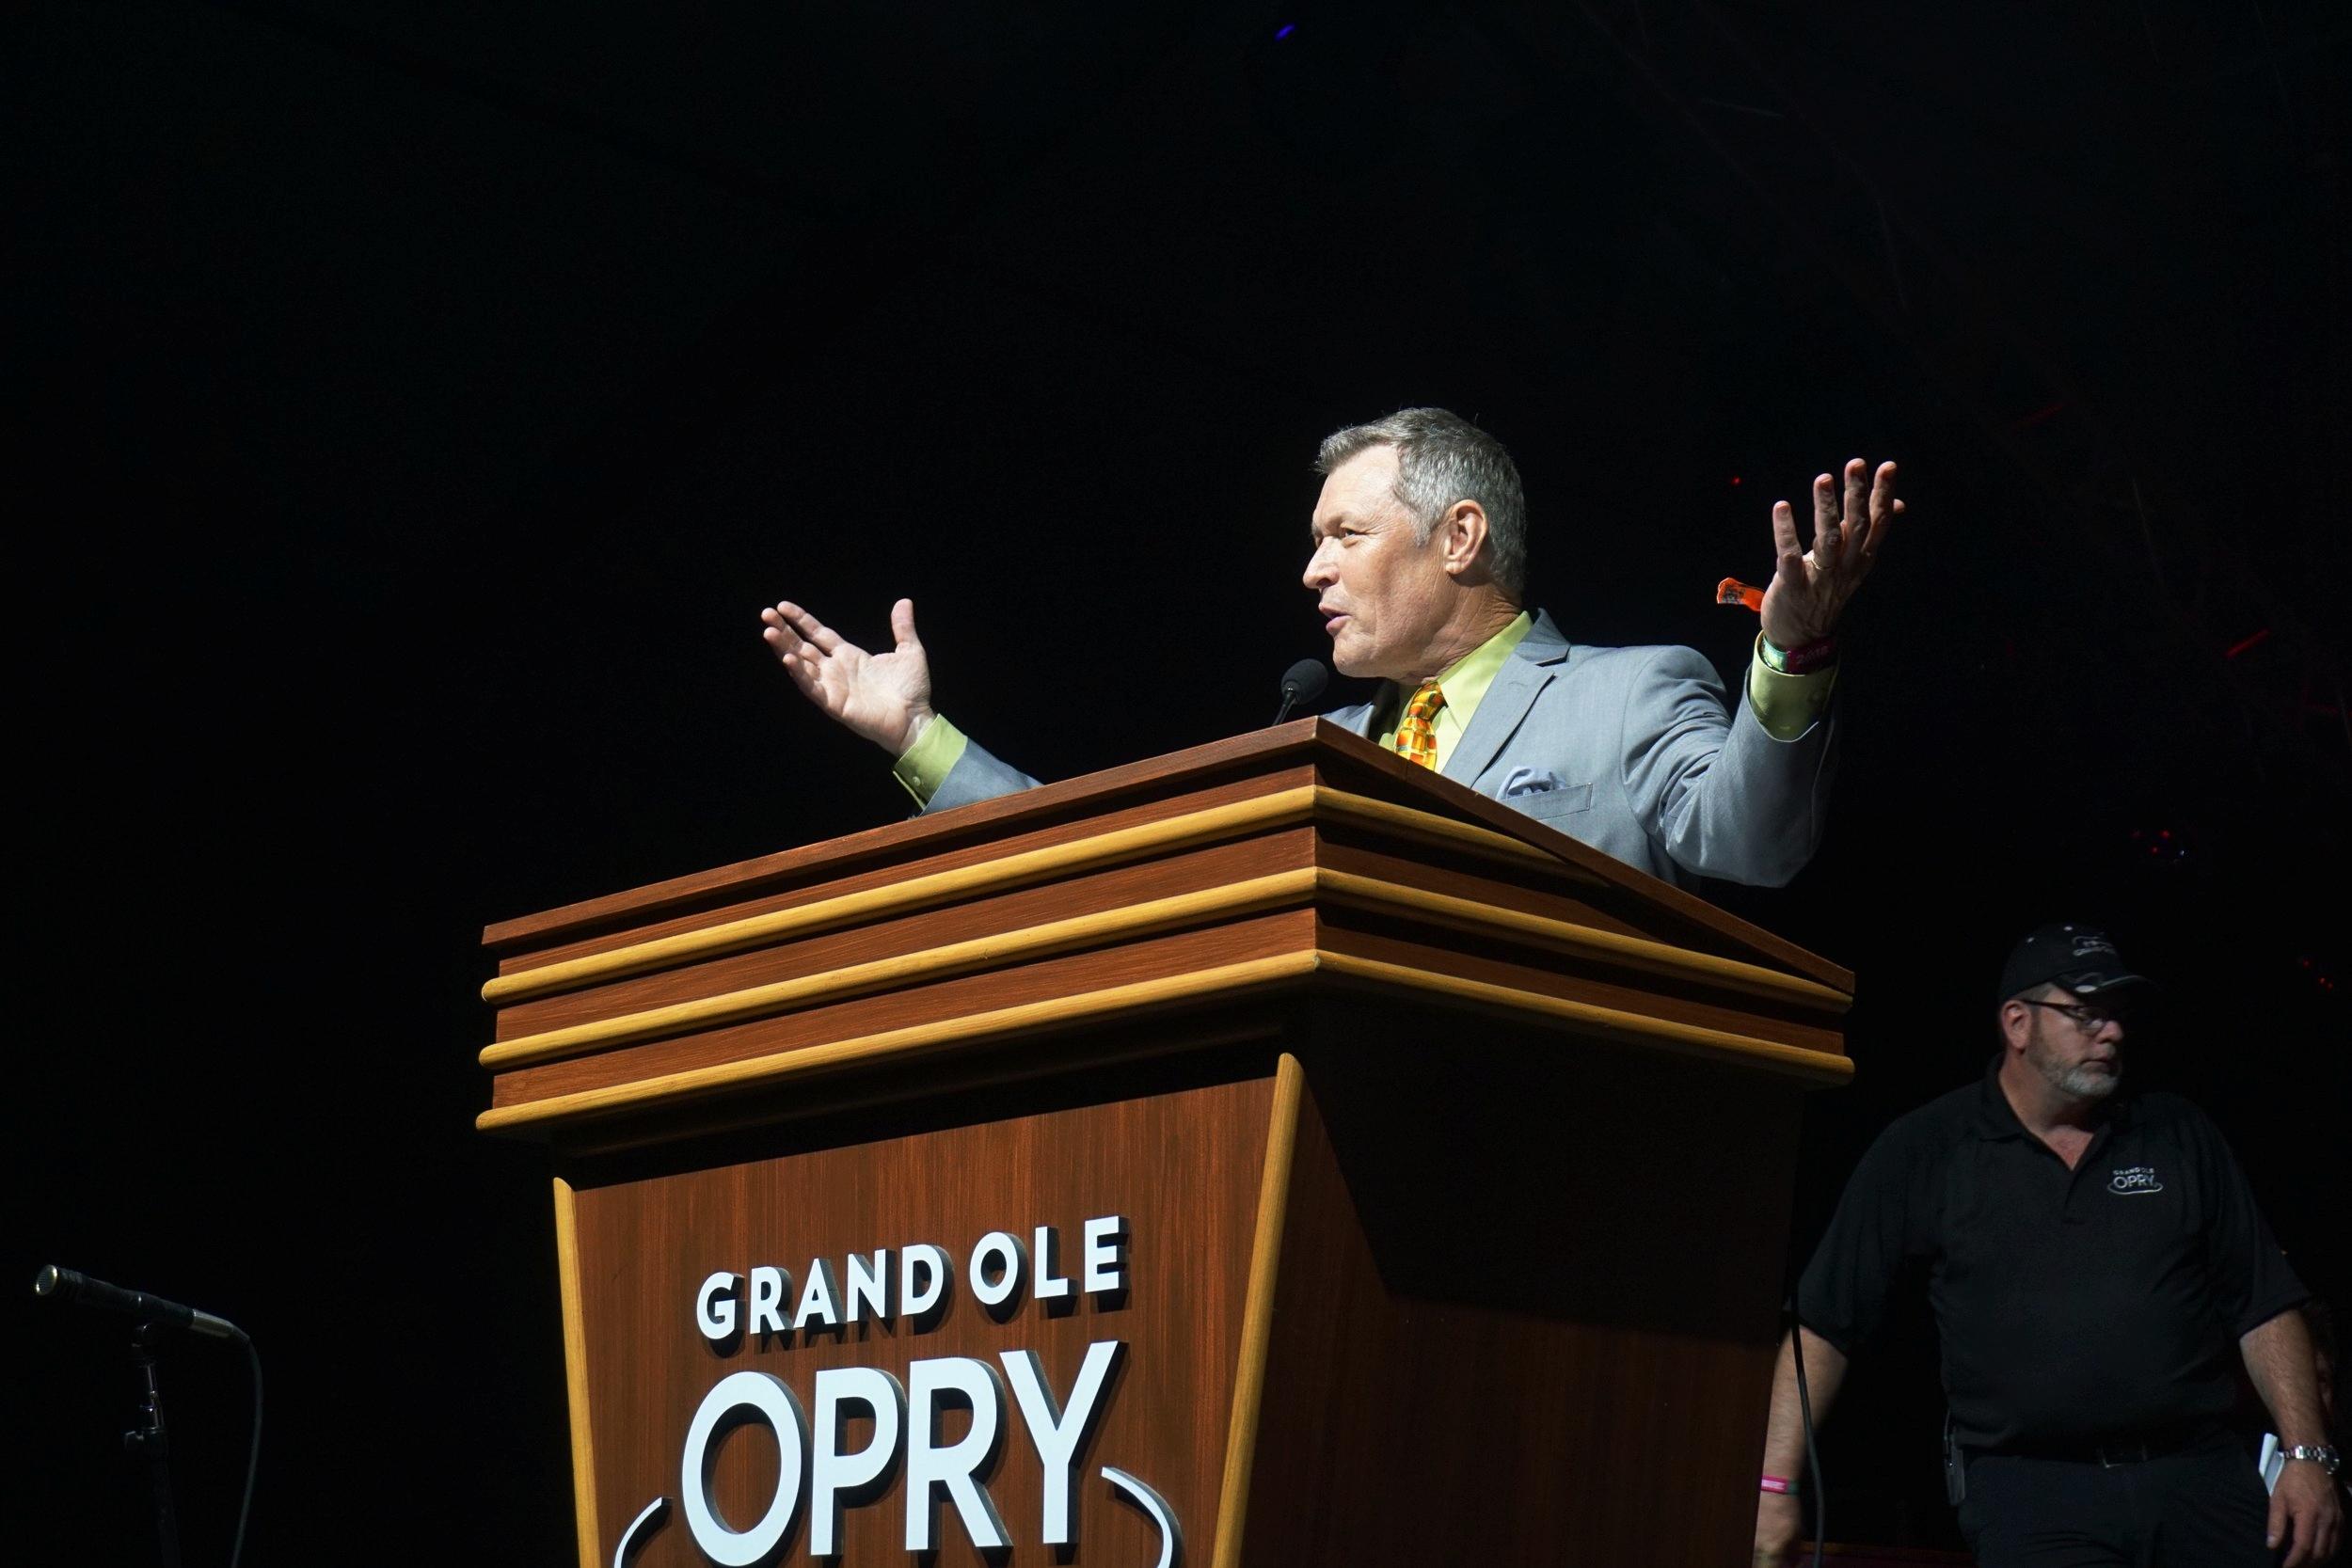 Grand Ole Opry emcee Bill Cody of 650 AM WSM